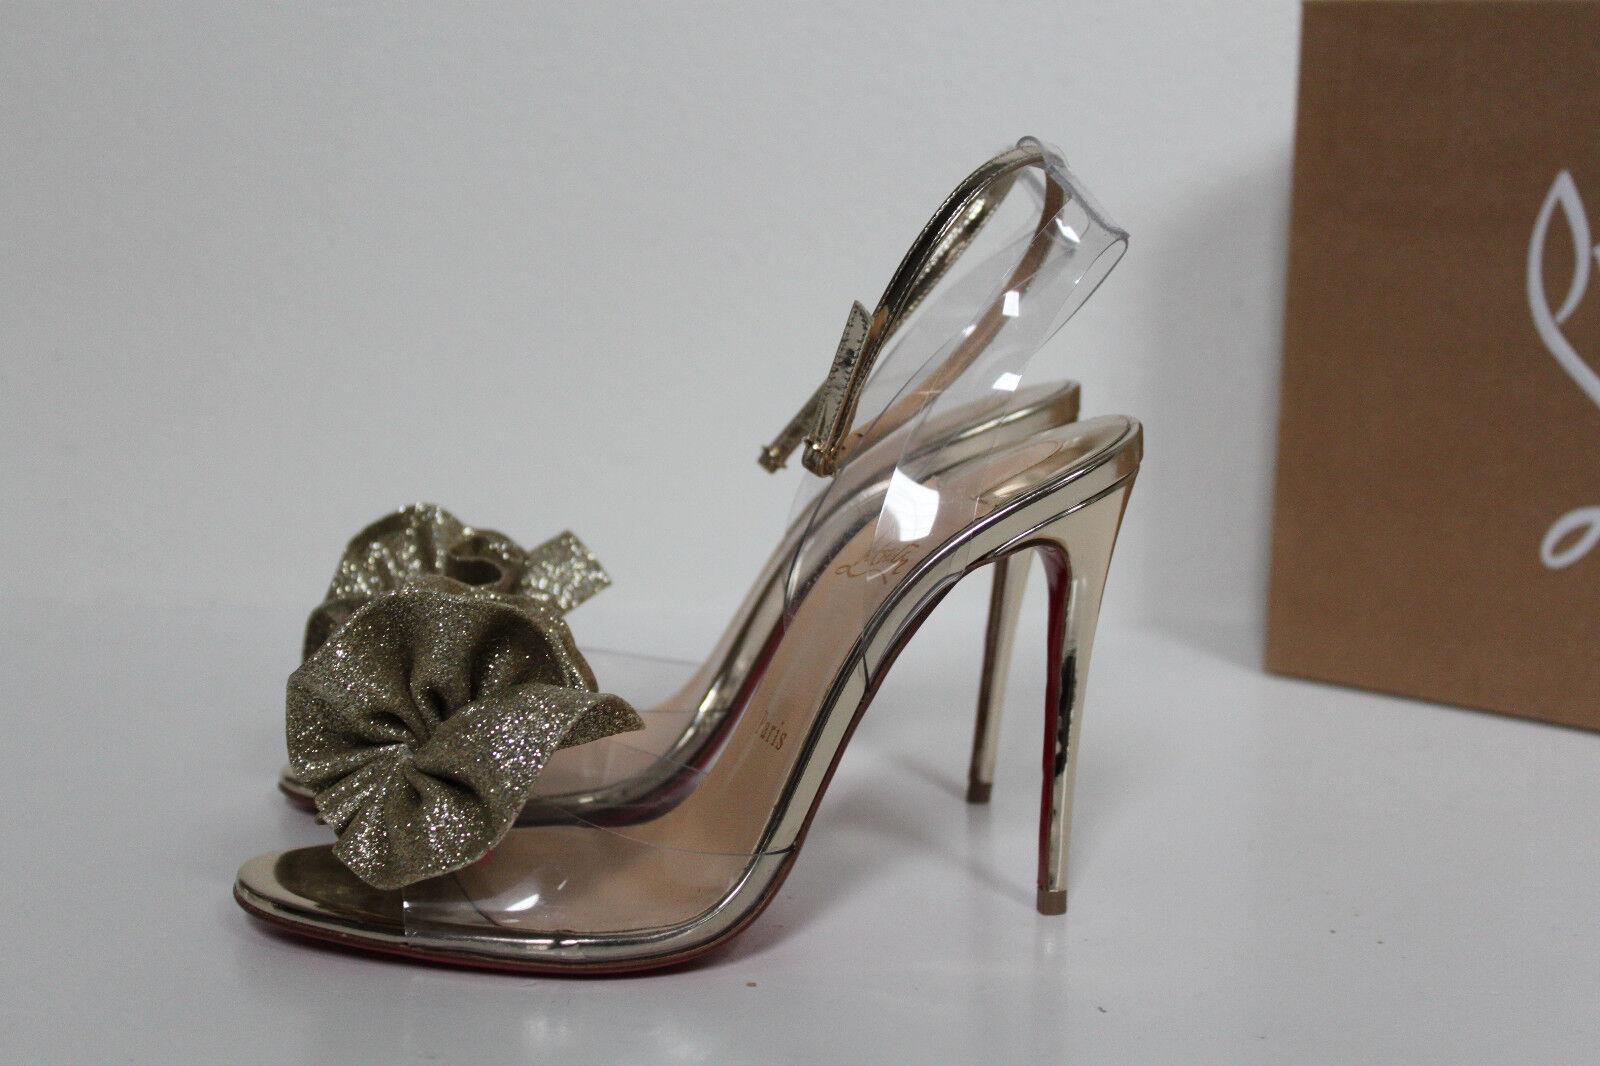 Sz 8.5     38.5 Christian Louboutin Fossiliza Gold Clear Ankle Strap Sandal schuhe 1b1413